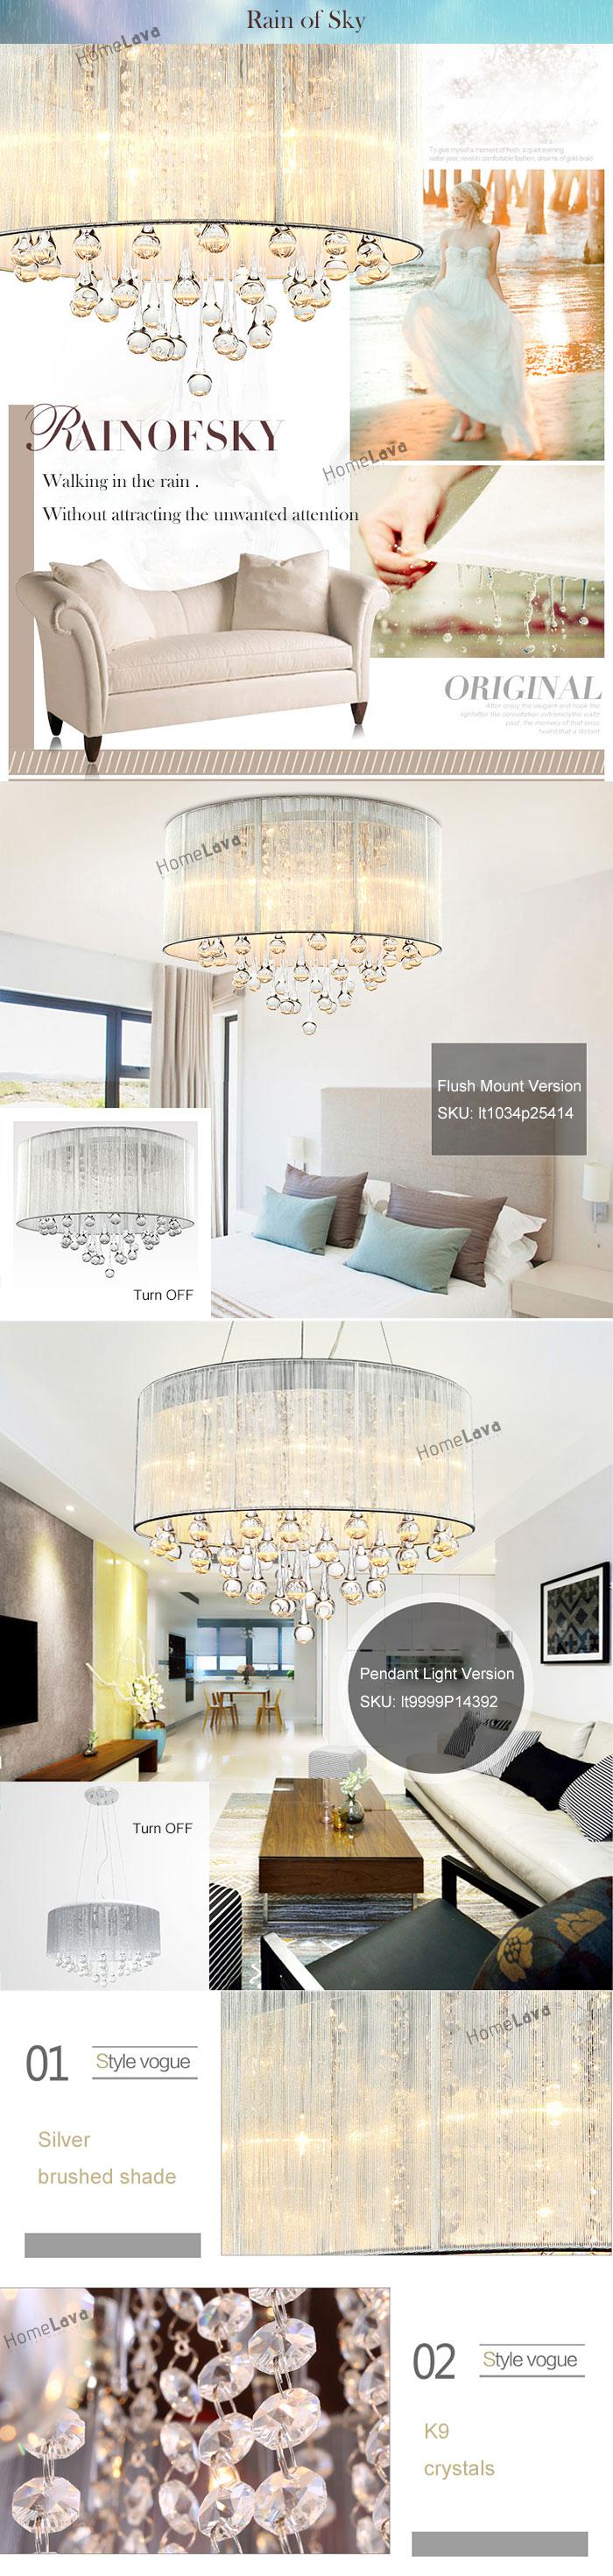 Modern Simple Fashion Round Crystal Flush Mount Ceiling Light 6 Lights(Rain of Sky)